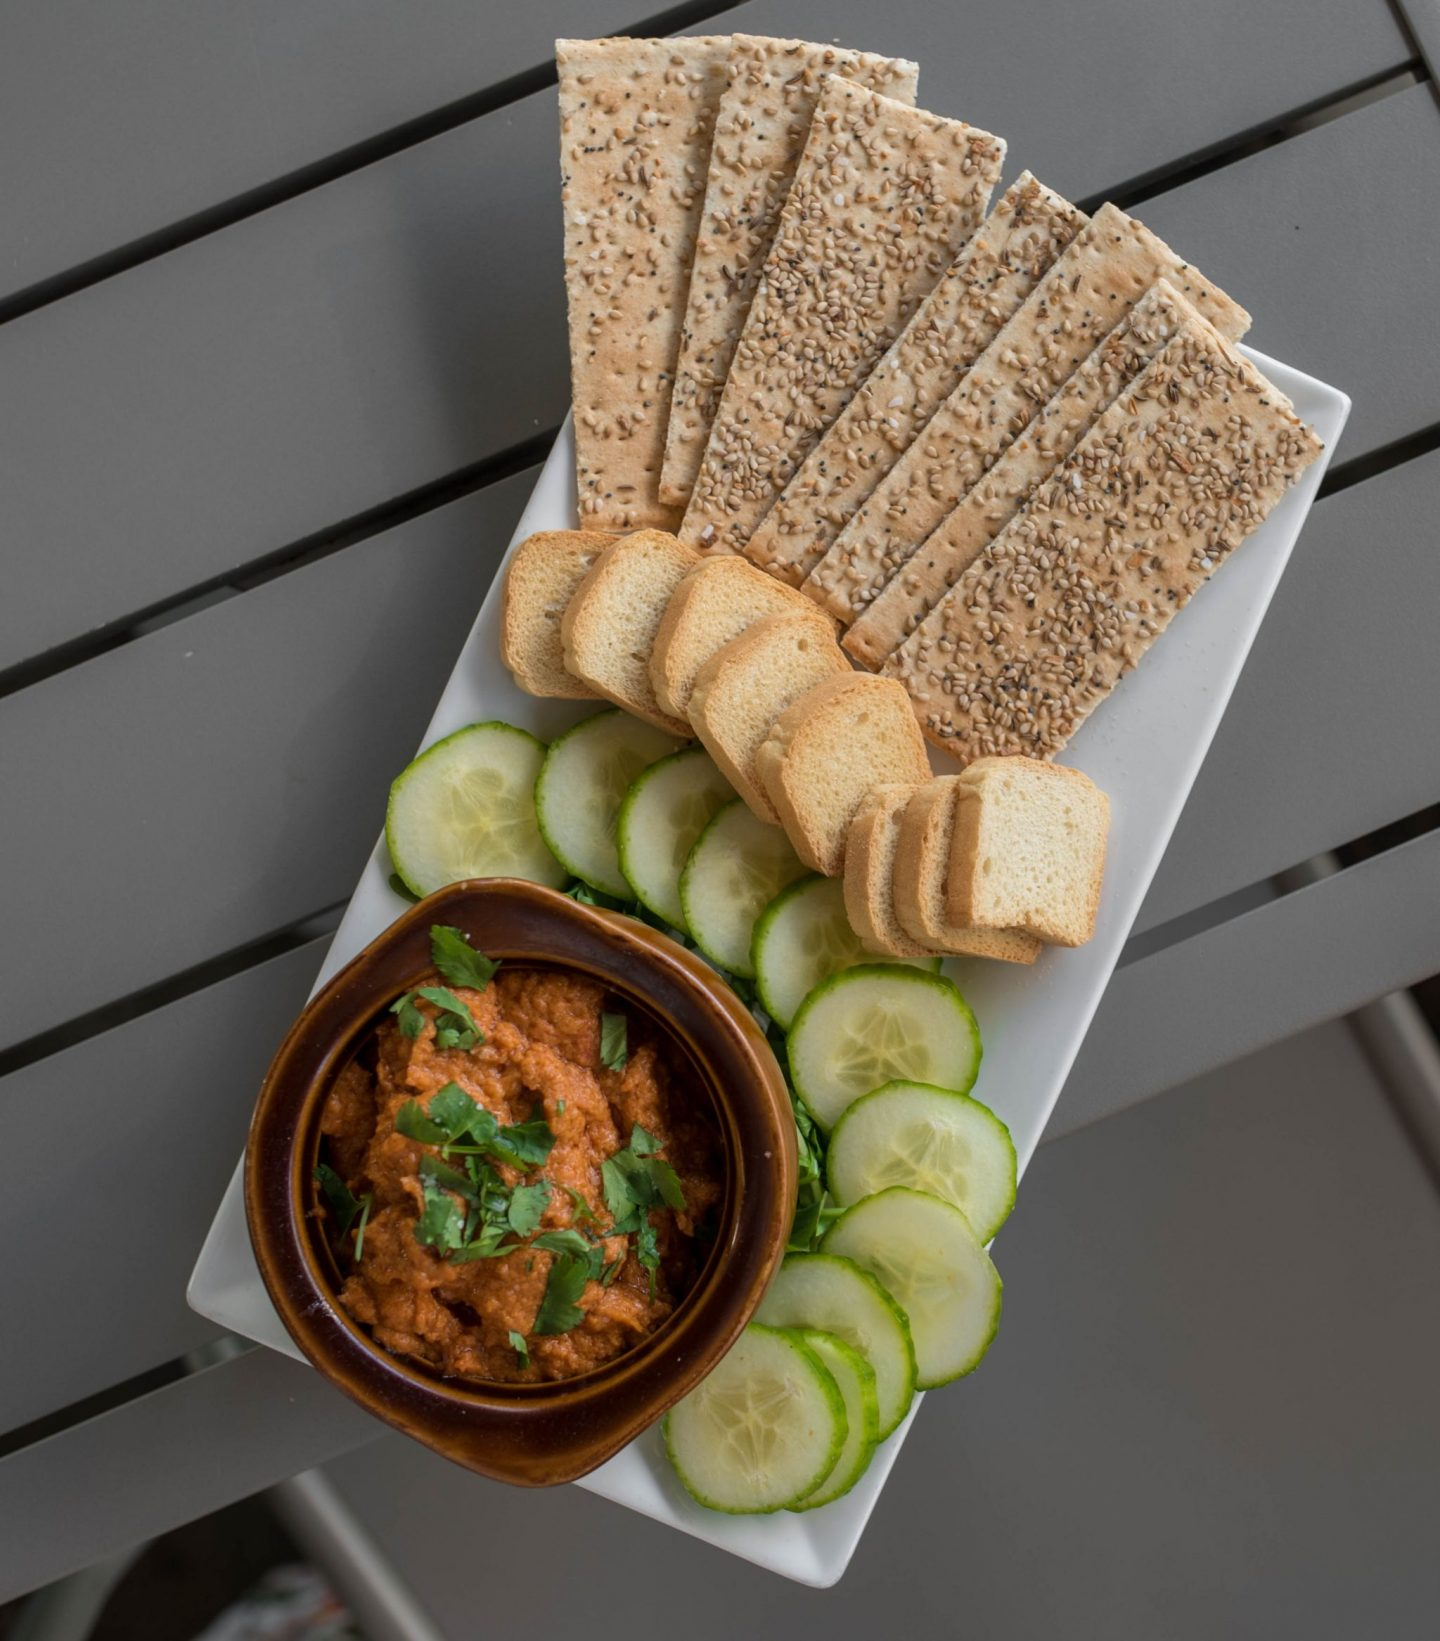 baltimore cultured spicy hummus